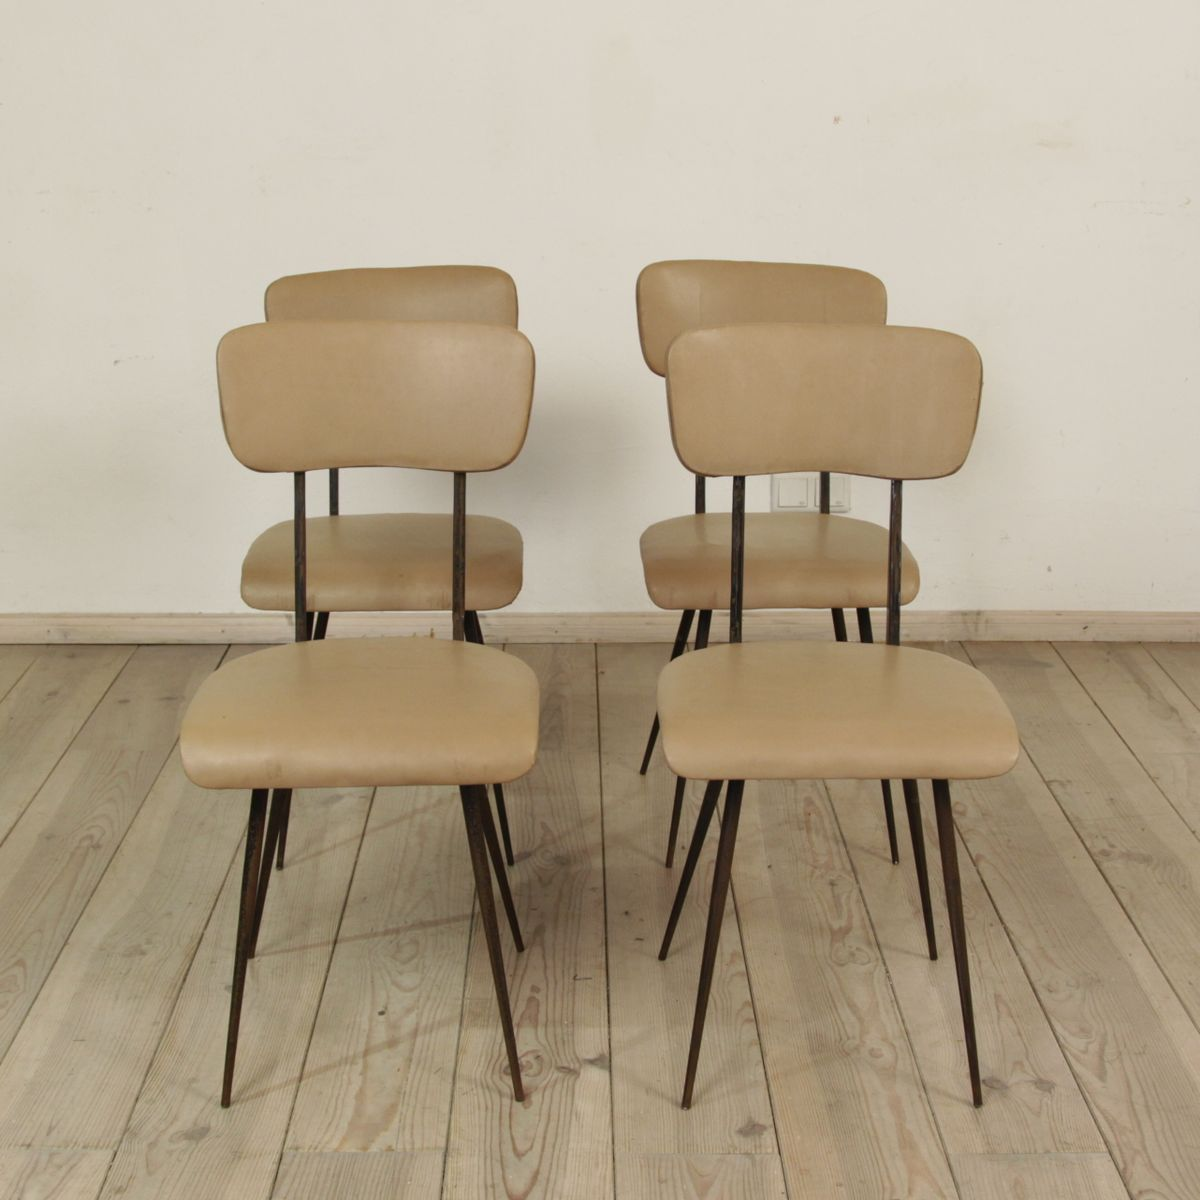 italienische st hle 1950er 4er set bei pamono kaufen. Black Bedroom Furniture Sets. Home Design Ideas